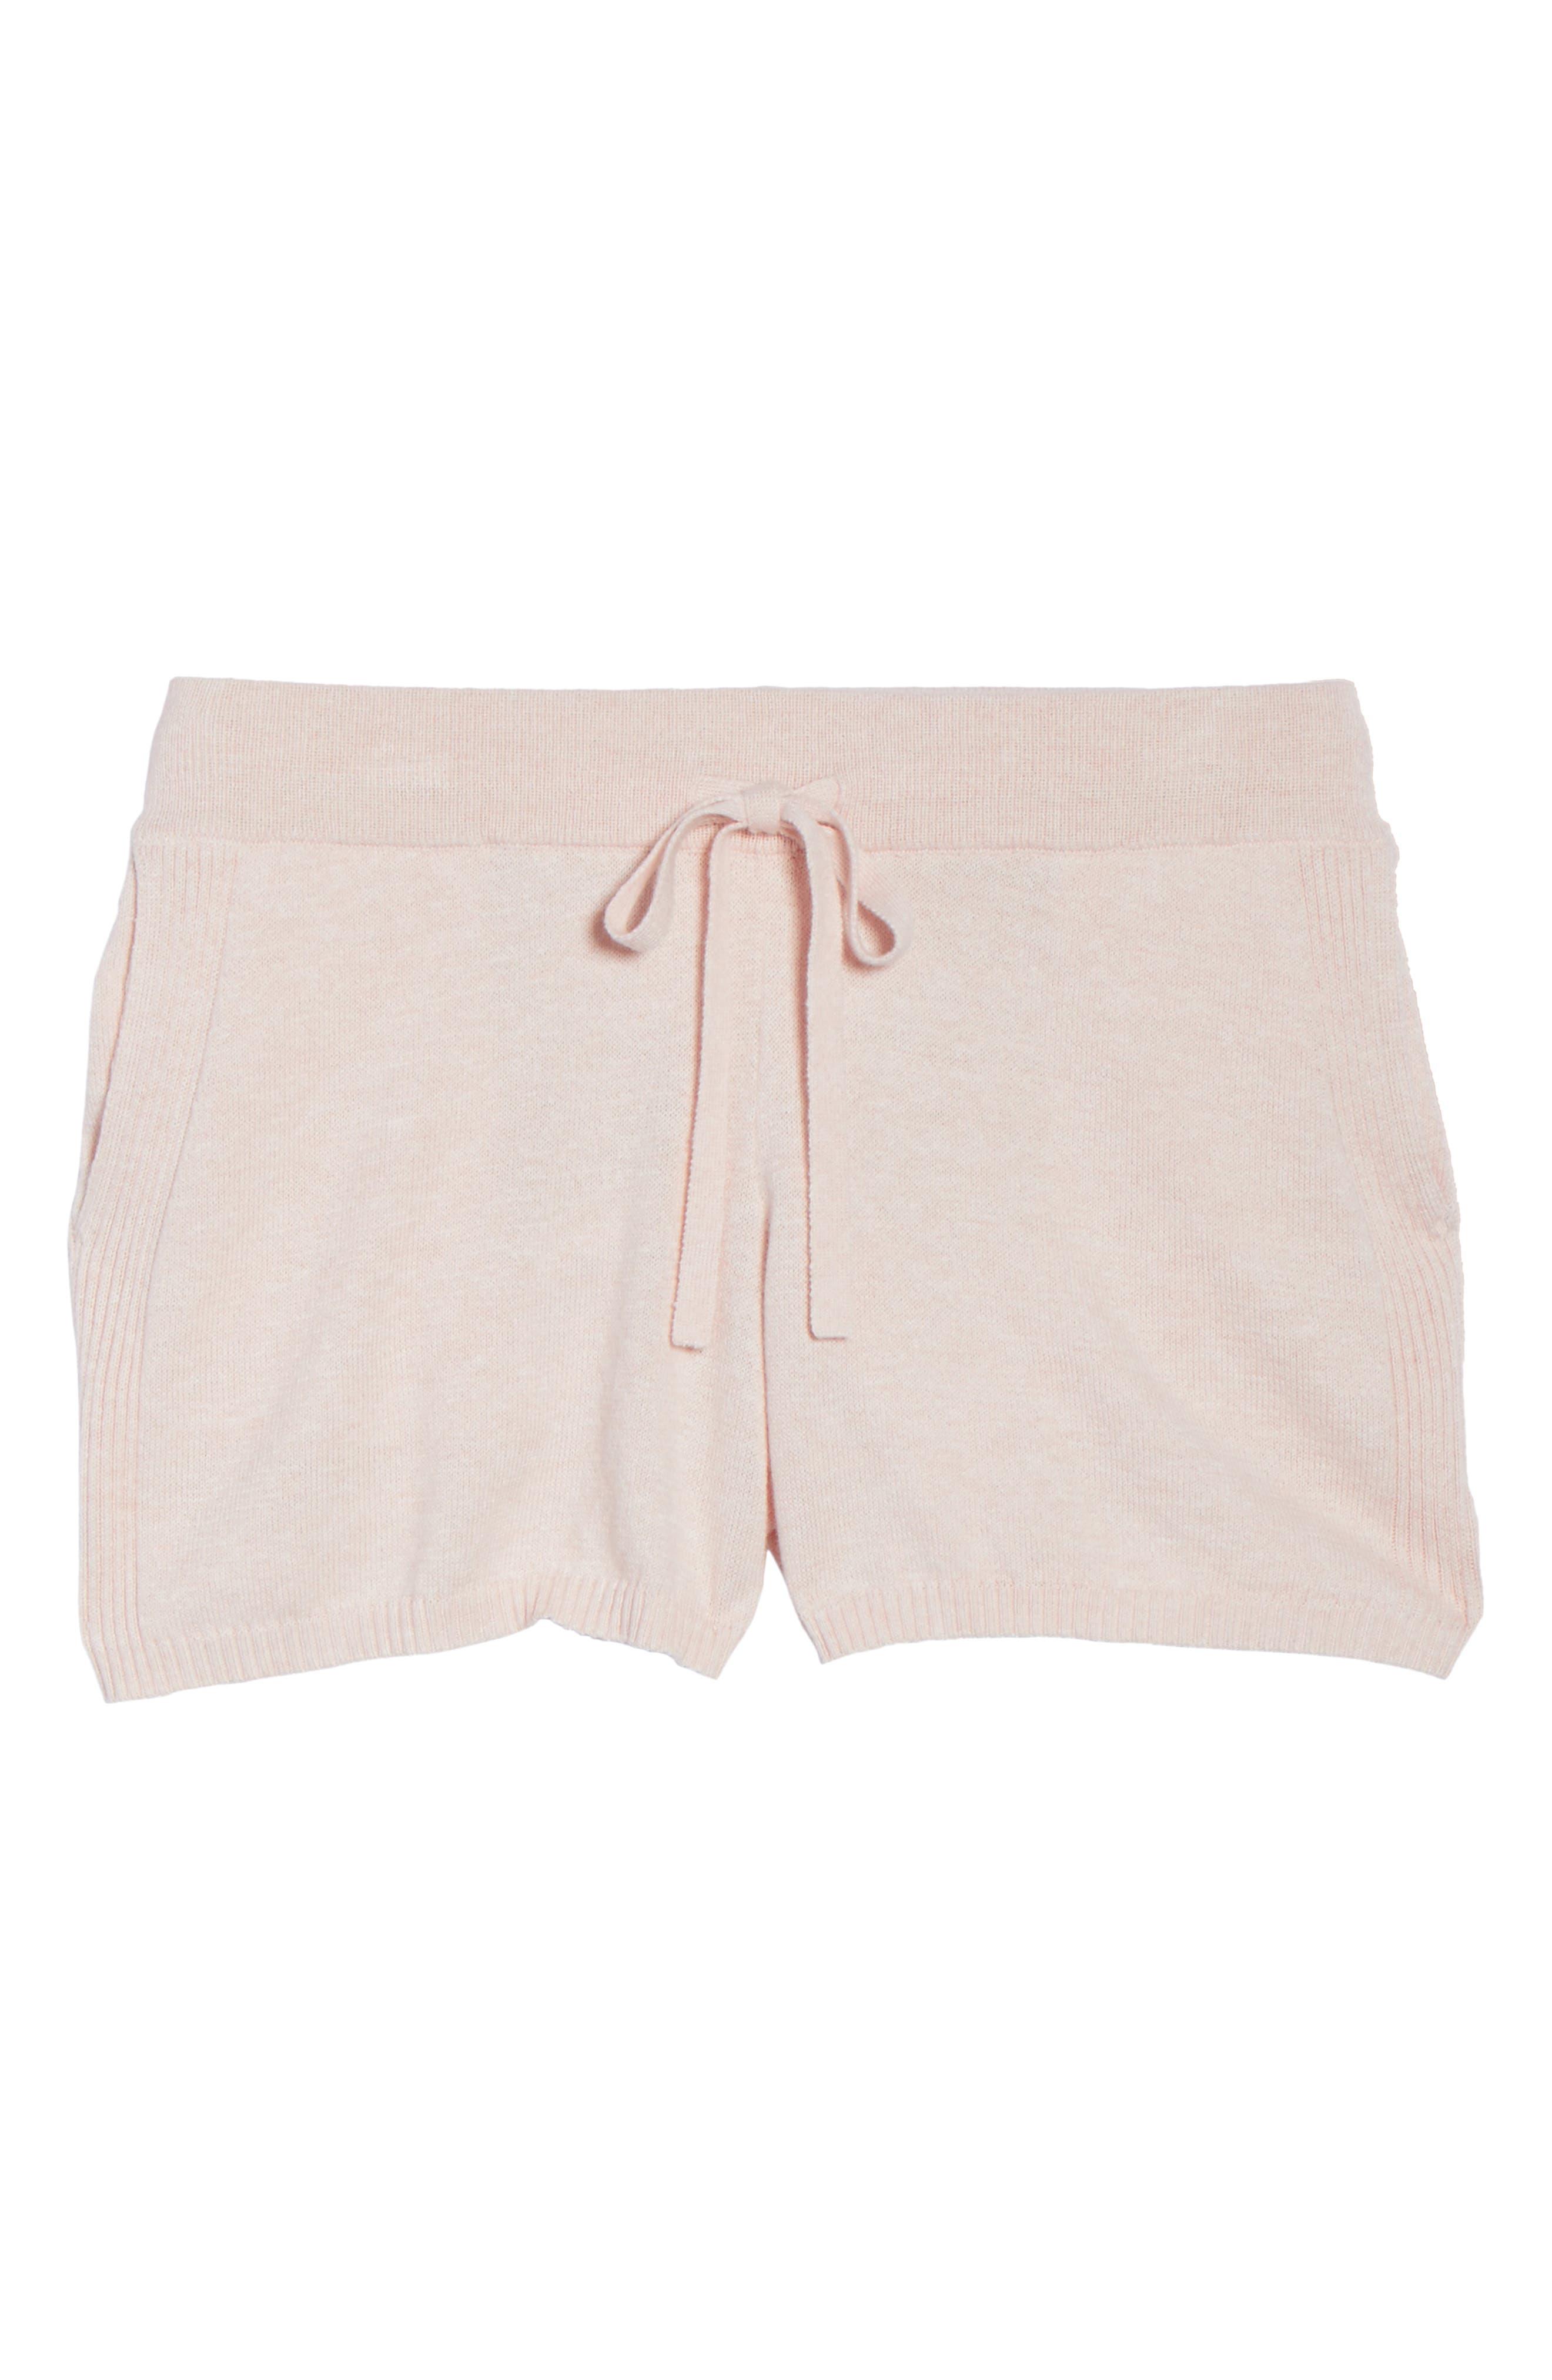 Vic Lounge Shorts,                             Alternate thumbnail 4, color,                             Soft Pink